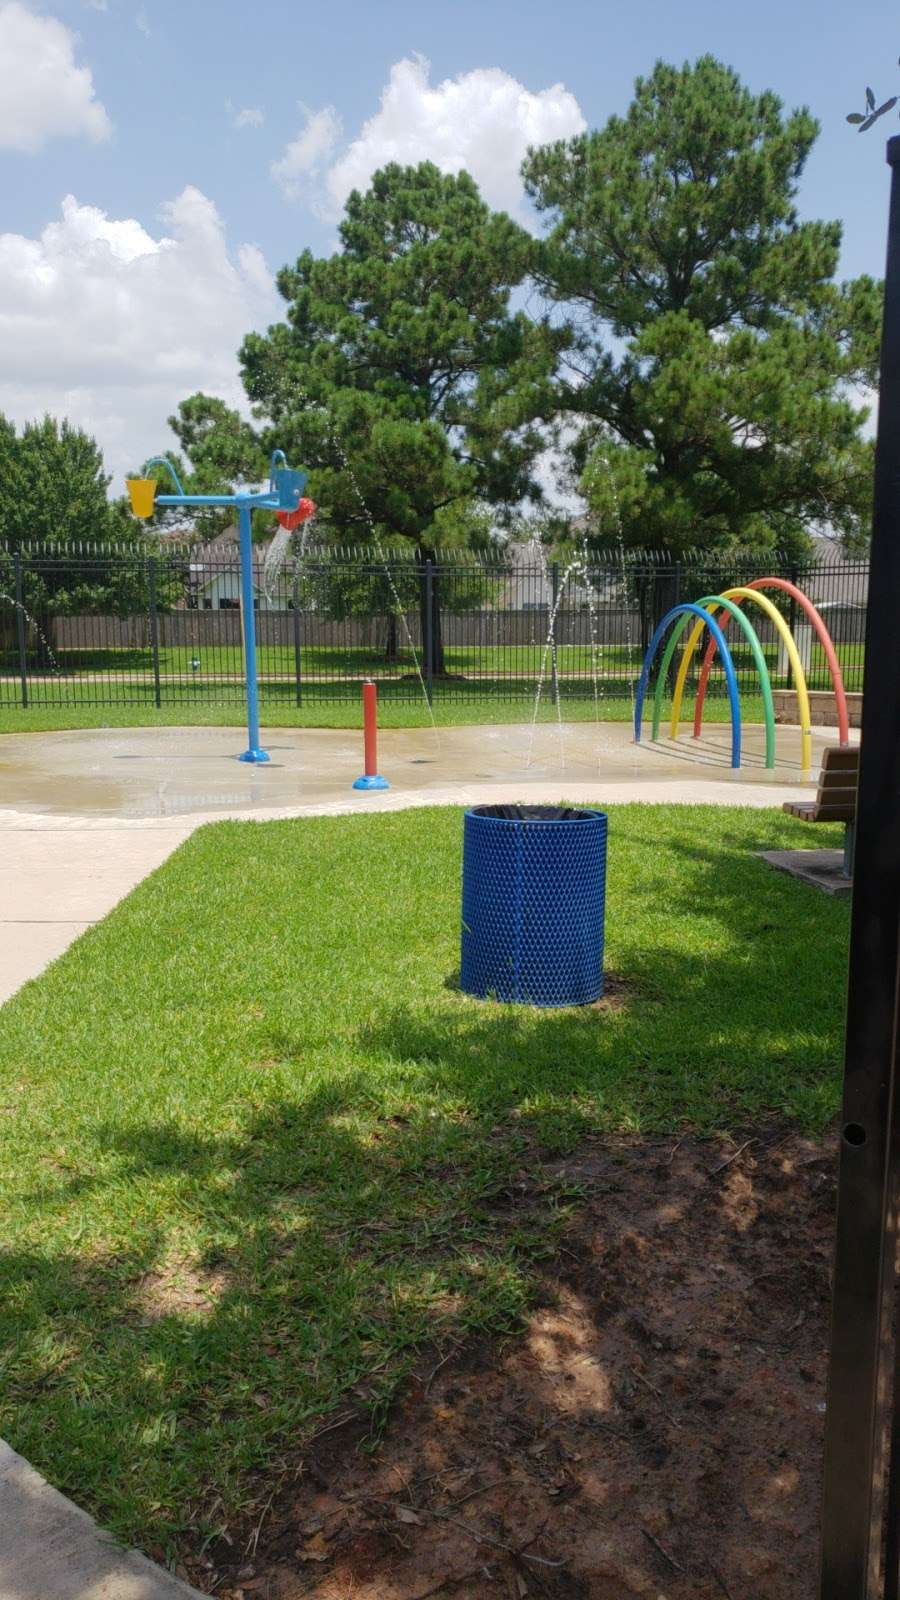 Westfield Pool/Splashpad/Tennis/Playground - park  | Photo 3 of 10 | Address: 19929, 20009 Misty Cove Dr, Katy, TX 77449, USA